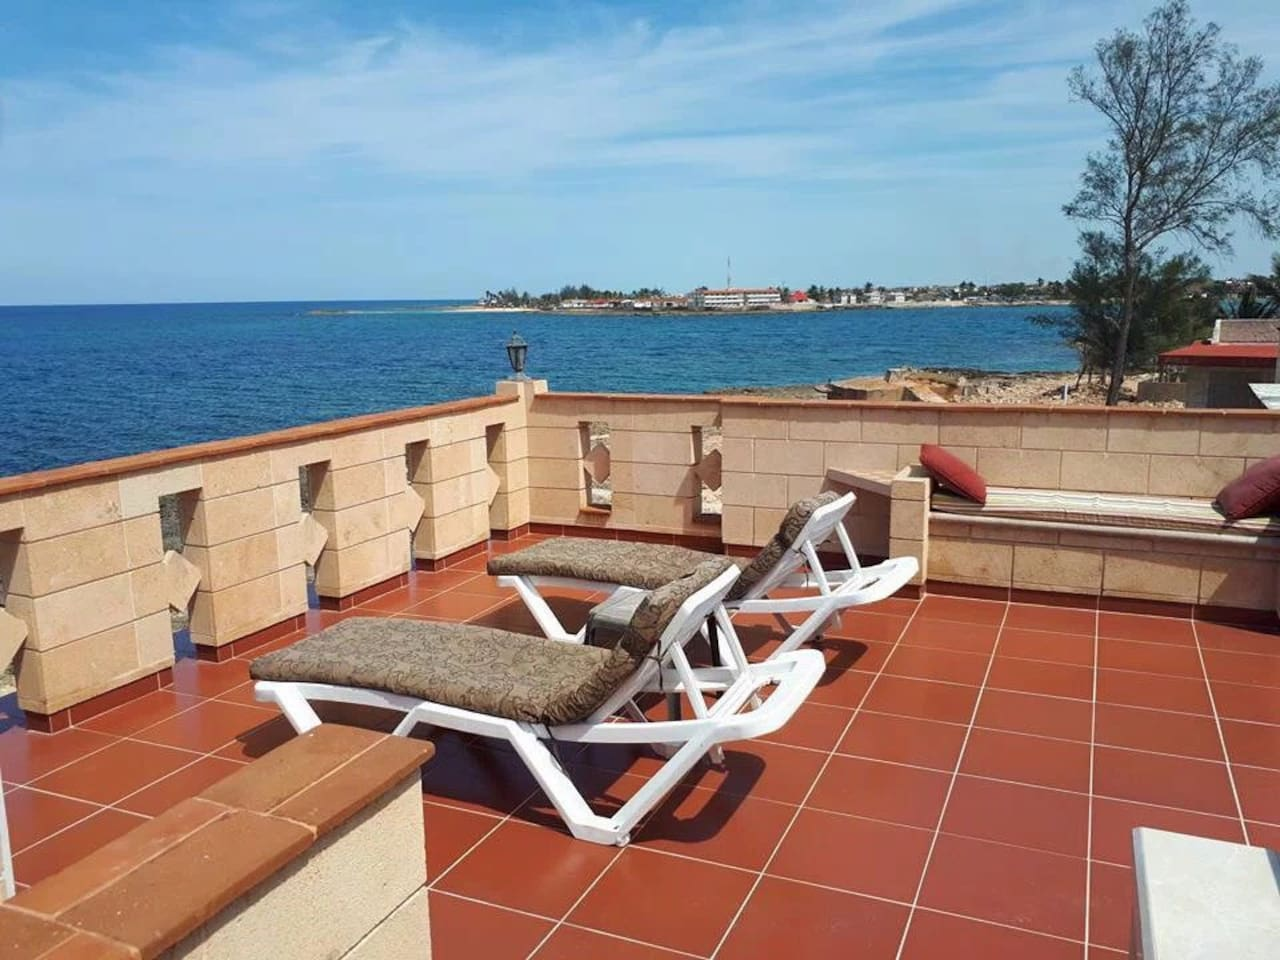 Apartment Casa Oceanview 2 - Luxury   Amazing View photo 28296301